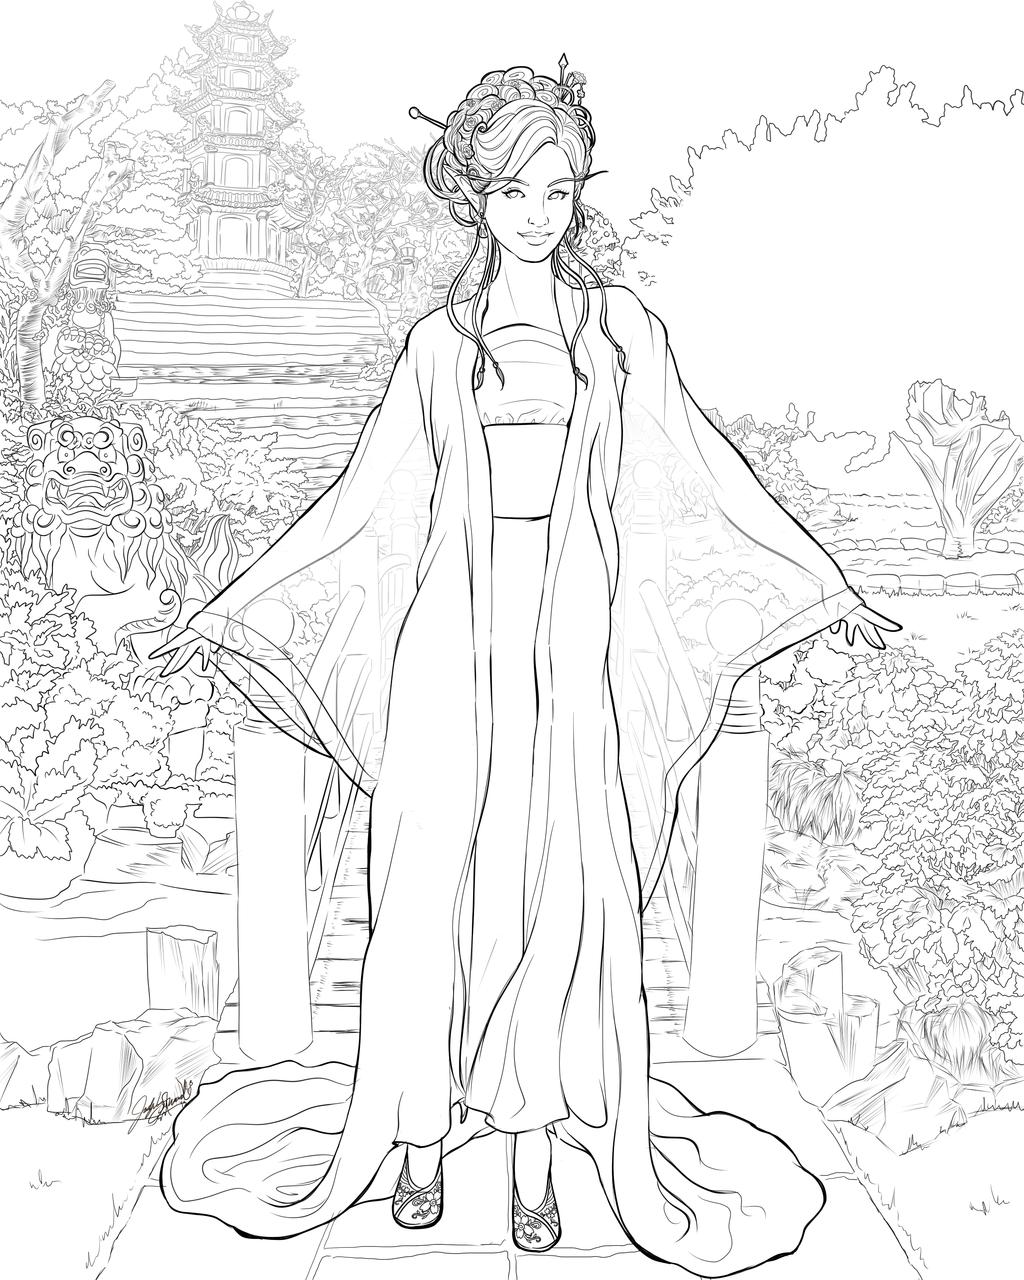 Flower garden sketch - Lines A Delicate Flower Grows In This Garden By Miserie Deviantart Com On